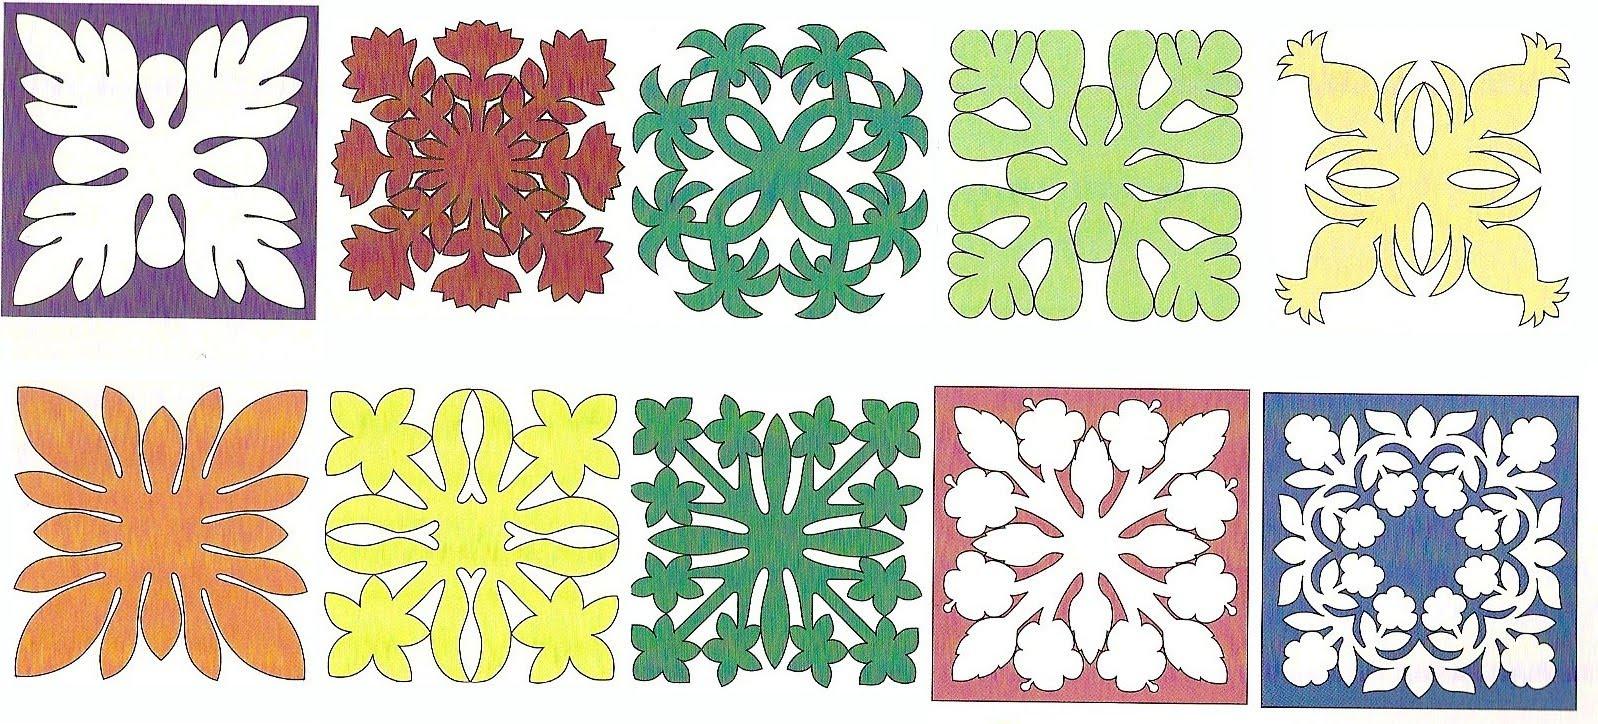 Free Hawaiian Quilt Pattern | Patterns Gallery - Free Printable Hawaiian Quilt Patterns